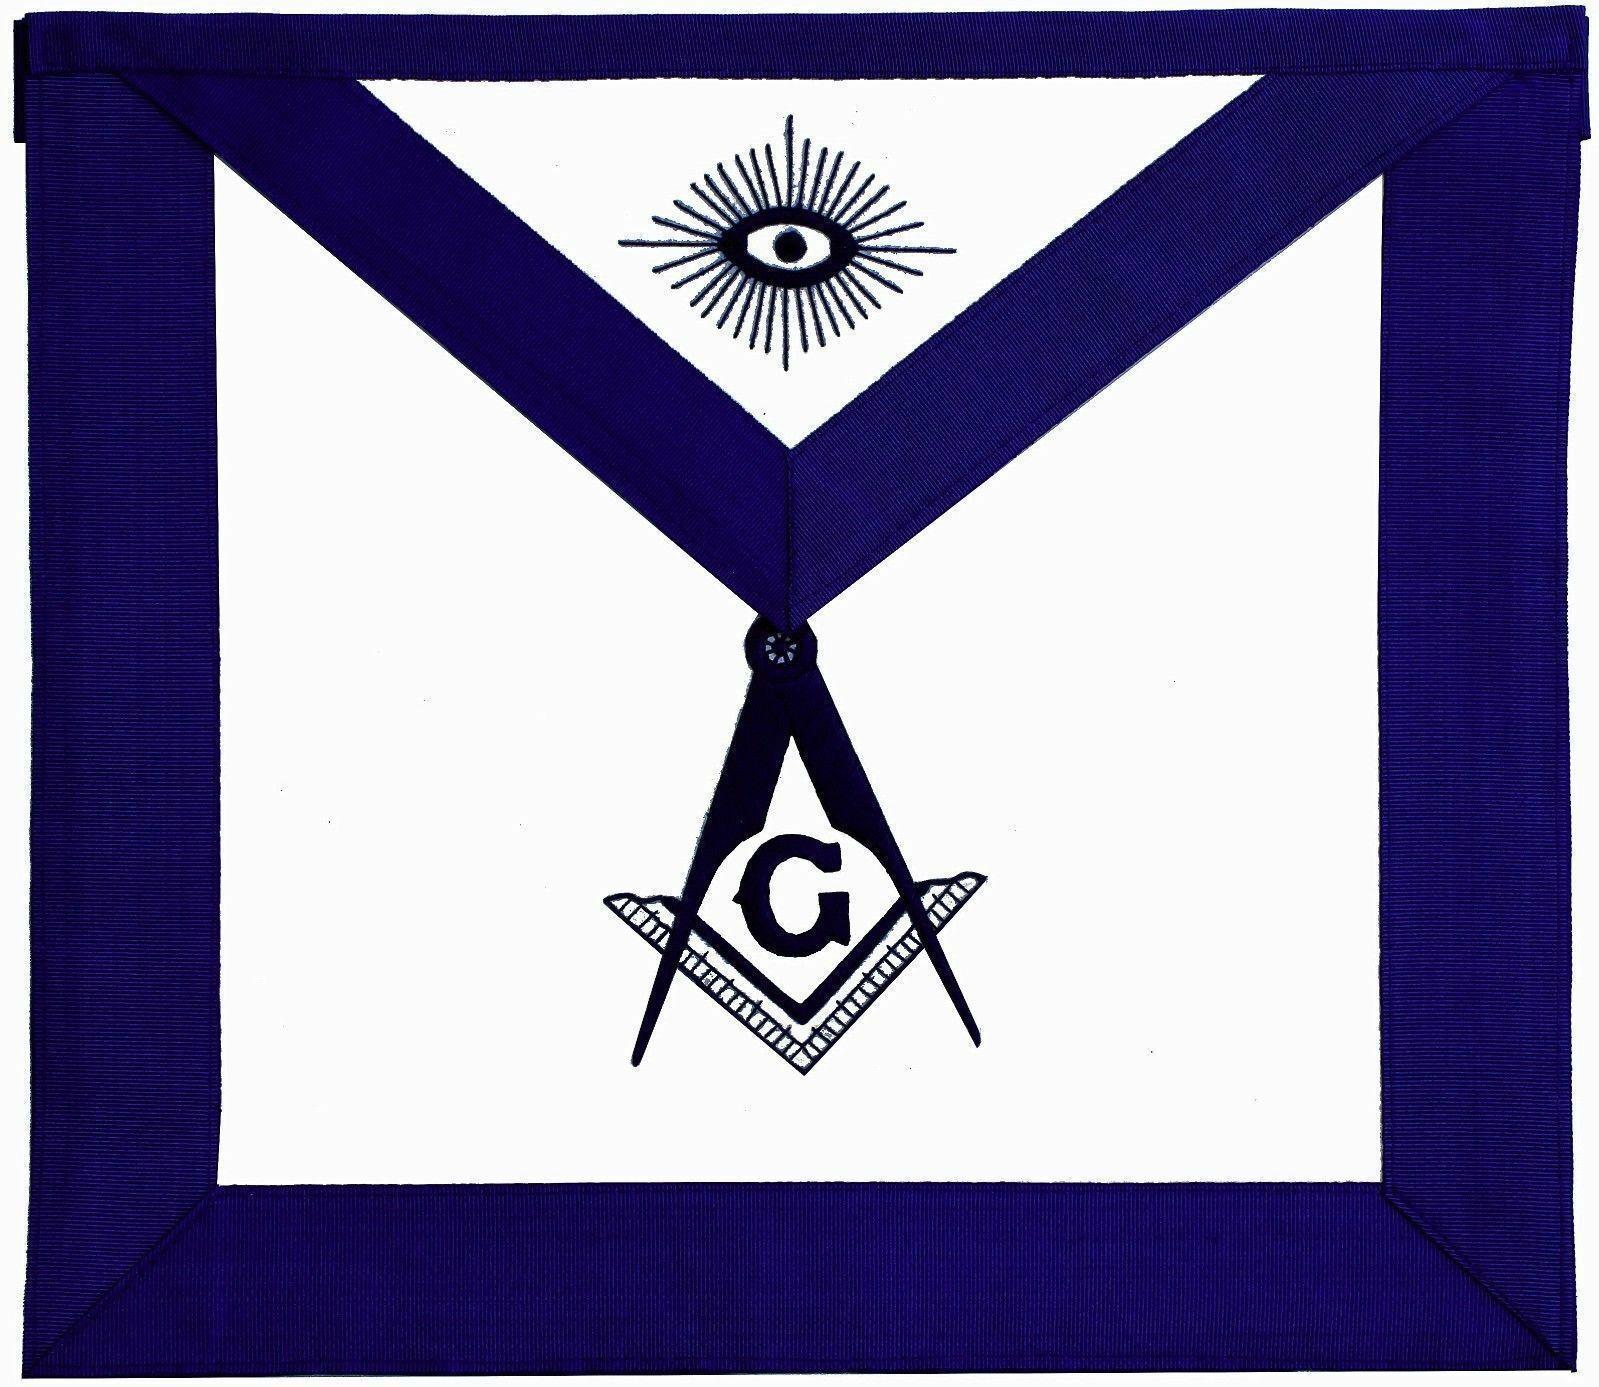 50 pieces Mason Master Masonic Apron Design White Leather Cabin Blue Embroidery Masonic Sign Great Masonic Gift